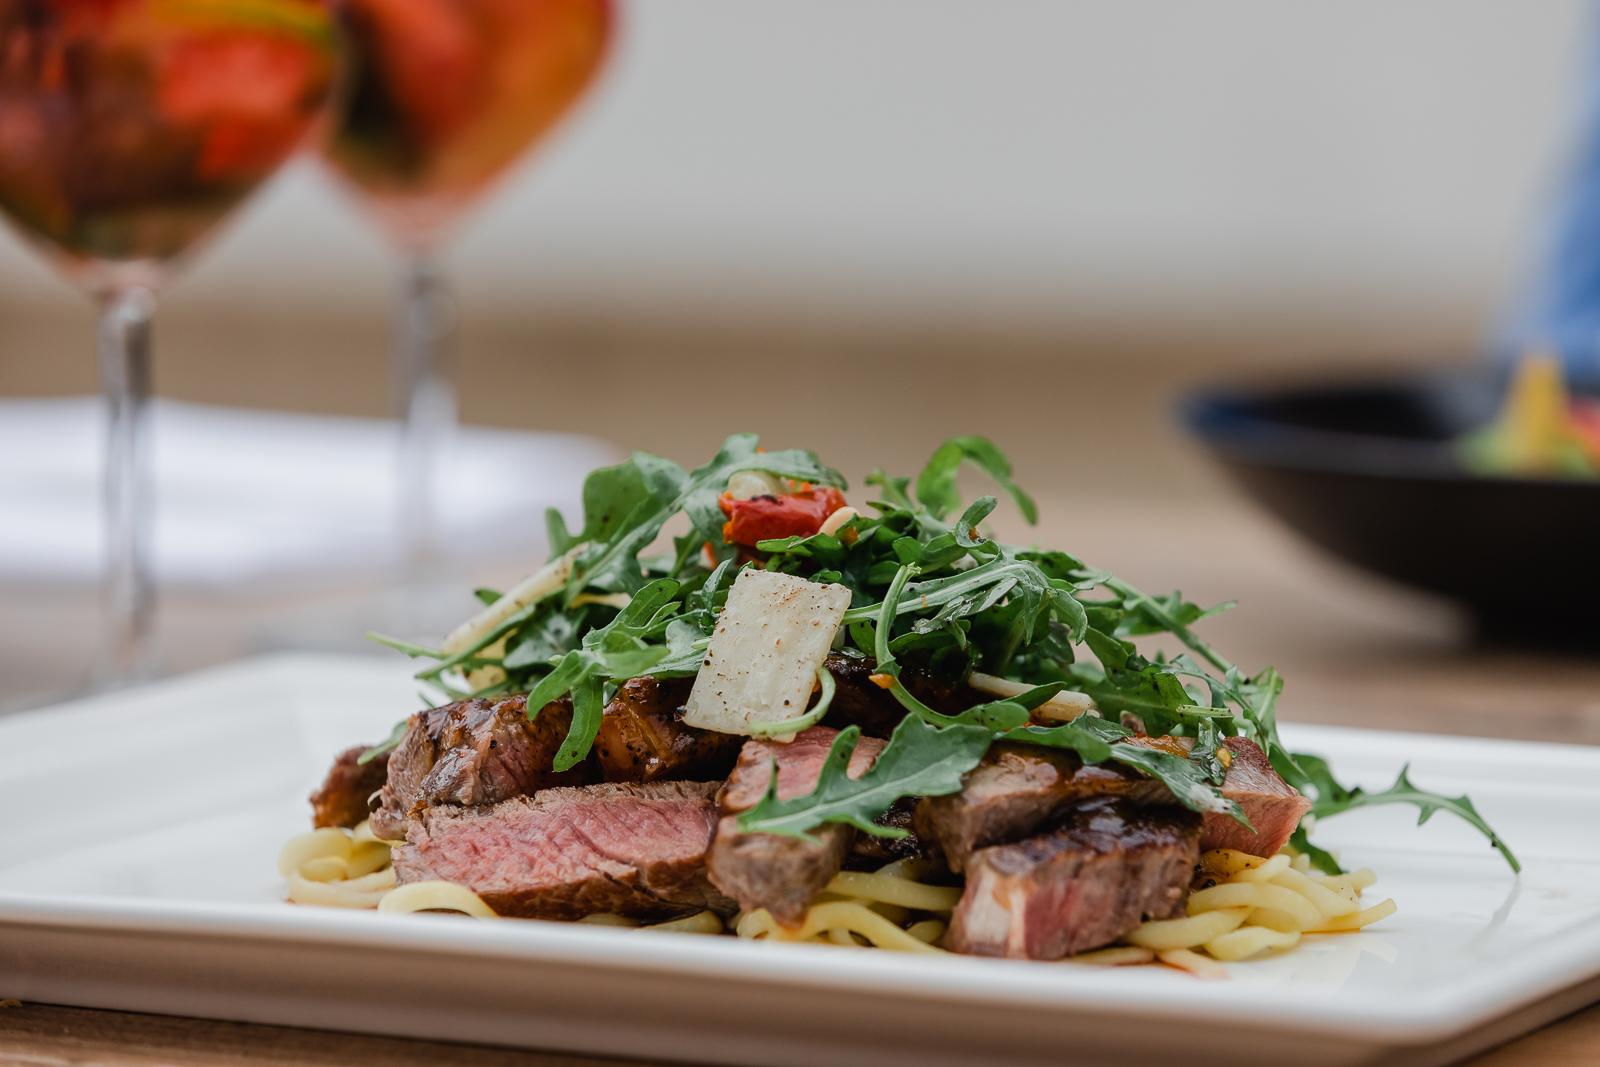 Plate of tagliatelli with steak and rucola